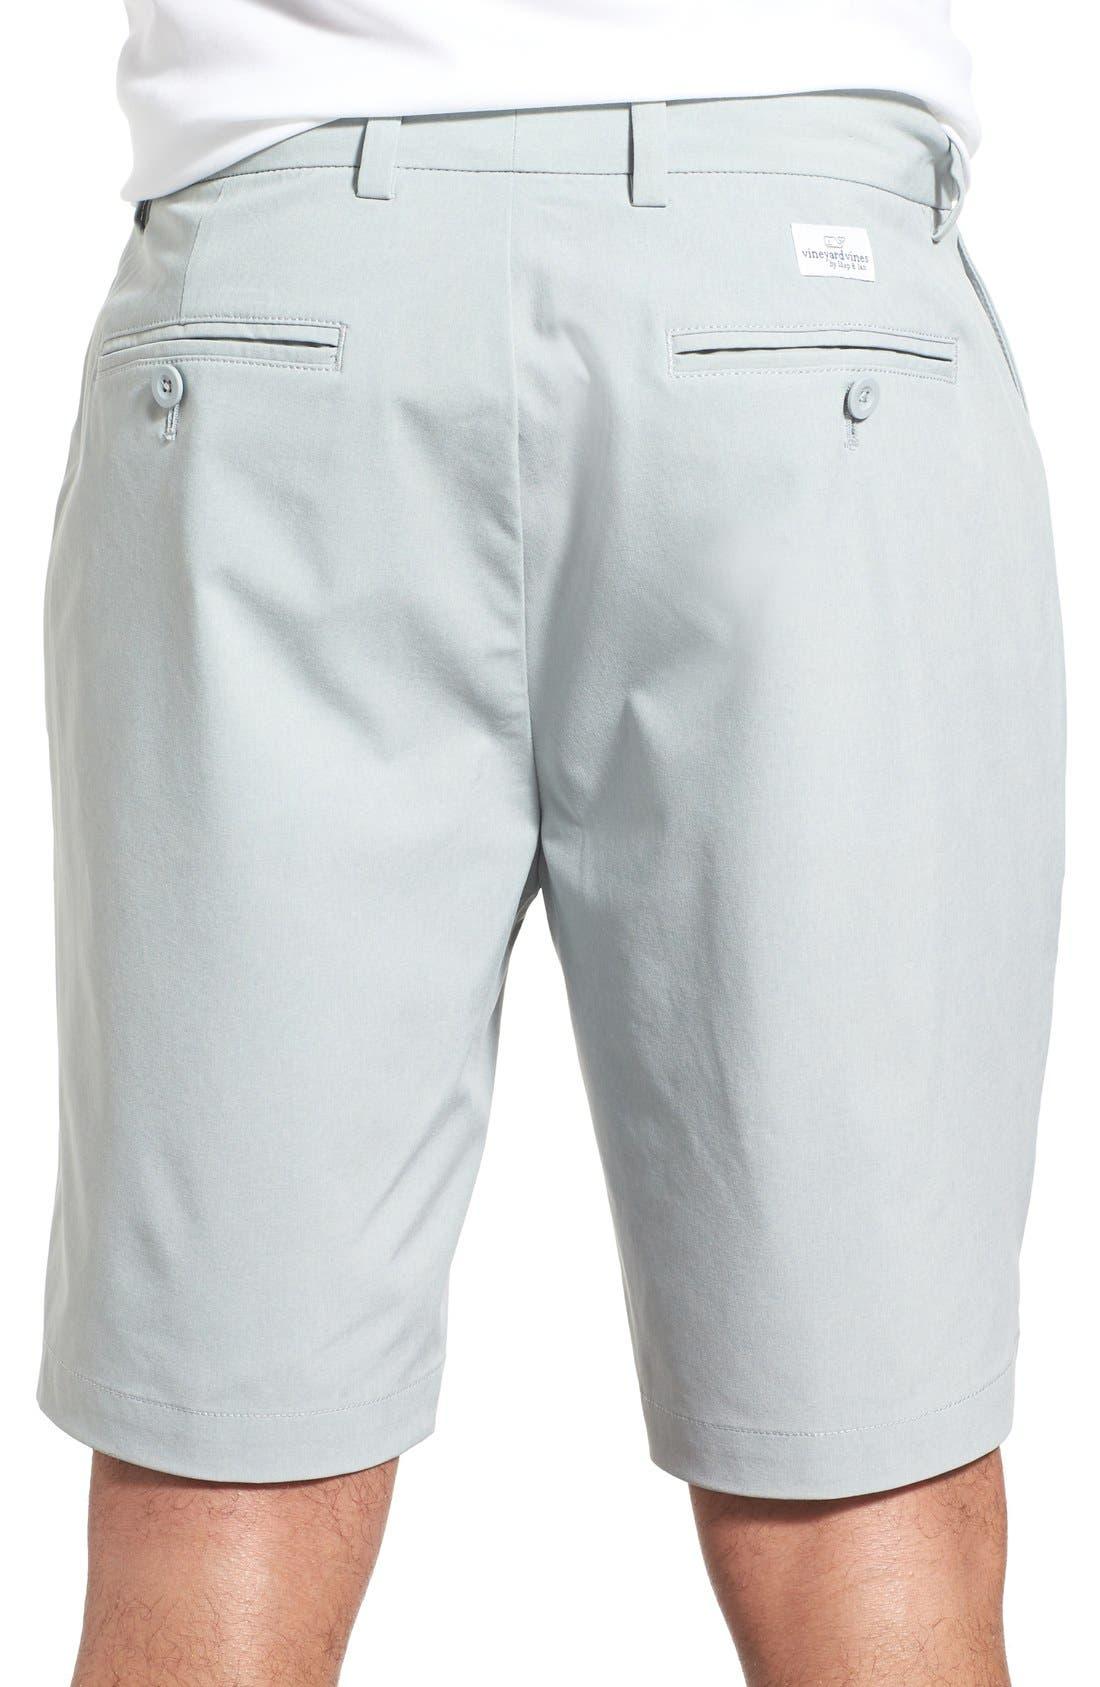 8 Inch Performance Breaker Shorts,                             Alternate thumbnail 74, color,